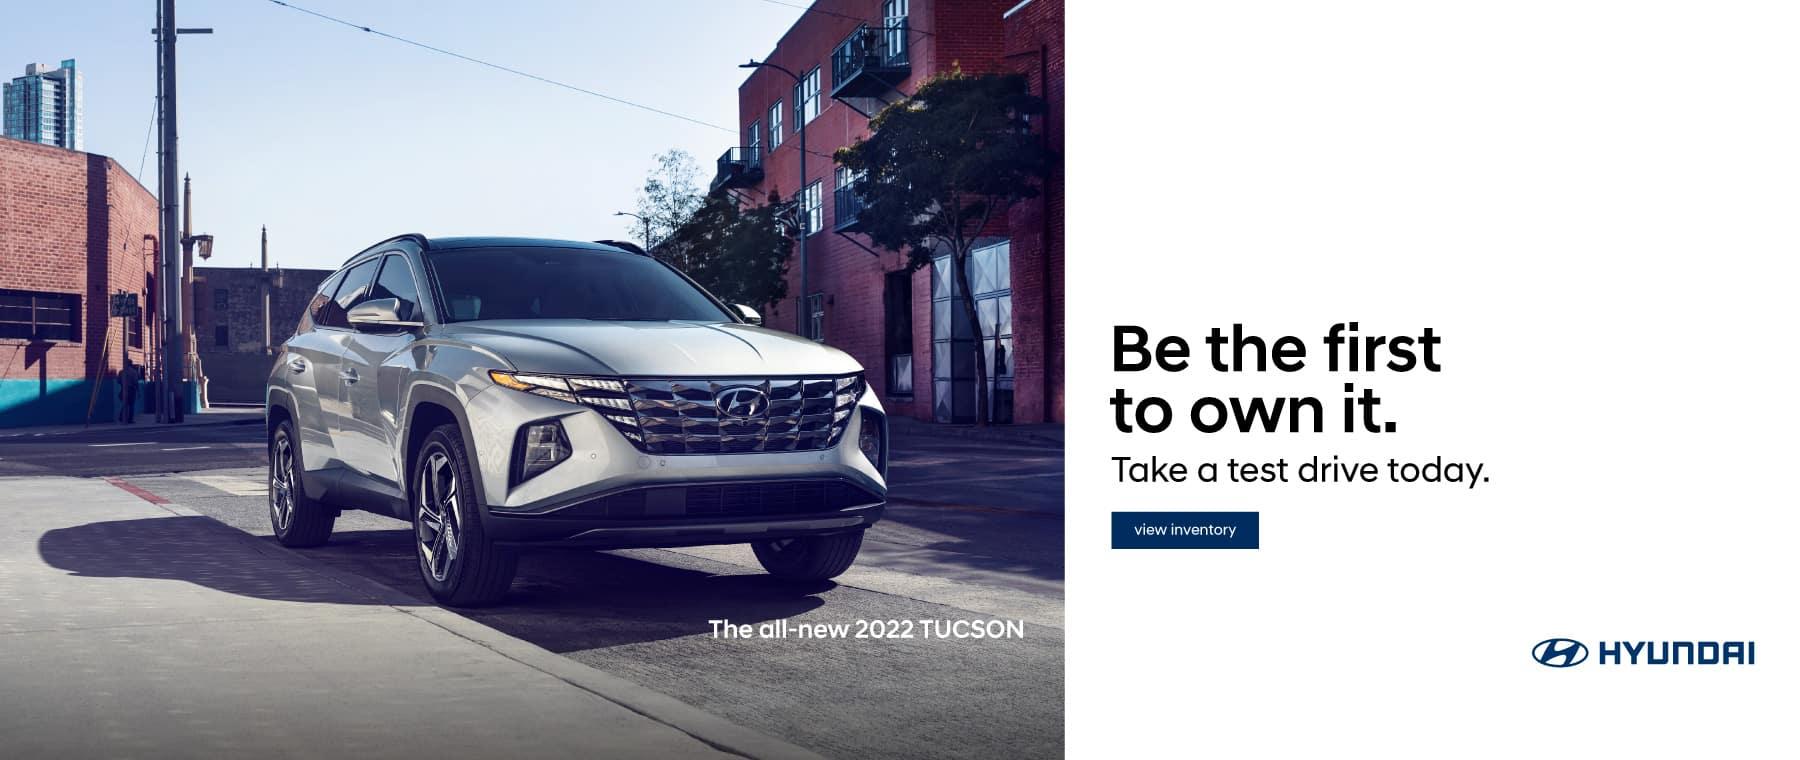 All New 2022 Hyundai Tucson Is Available at Rosen Hyundai Greenfield